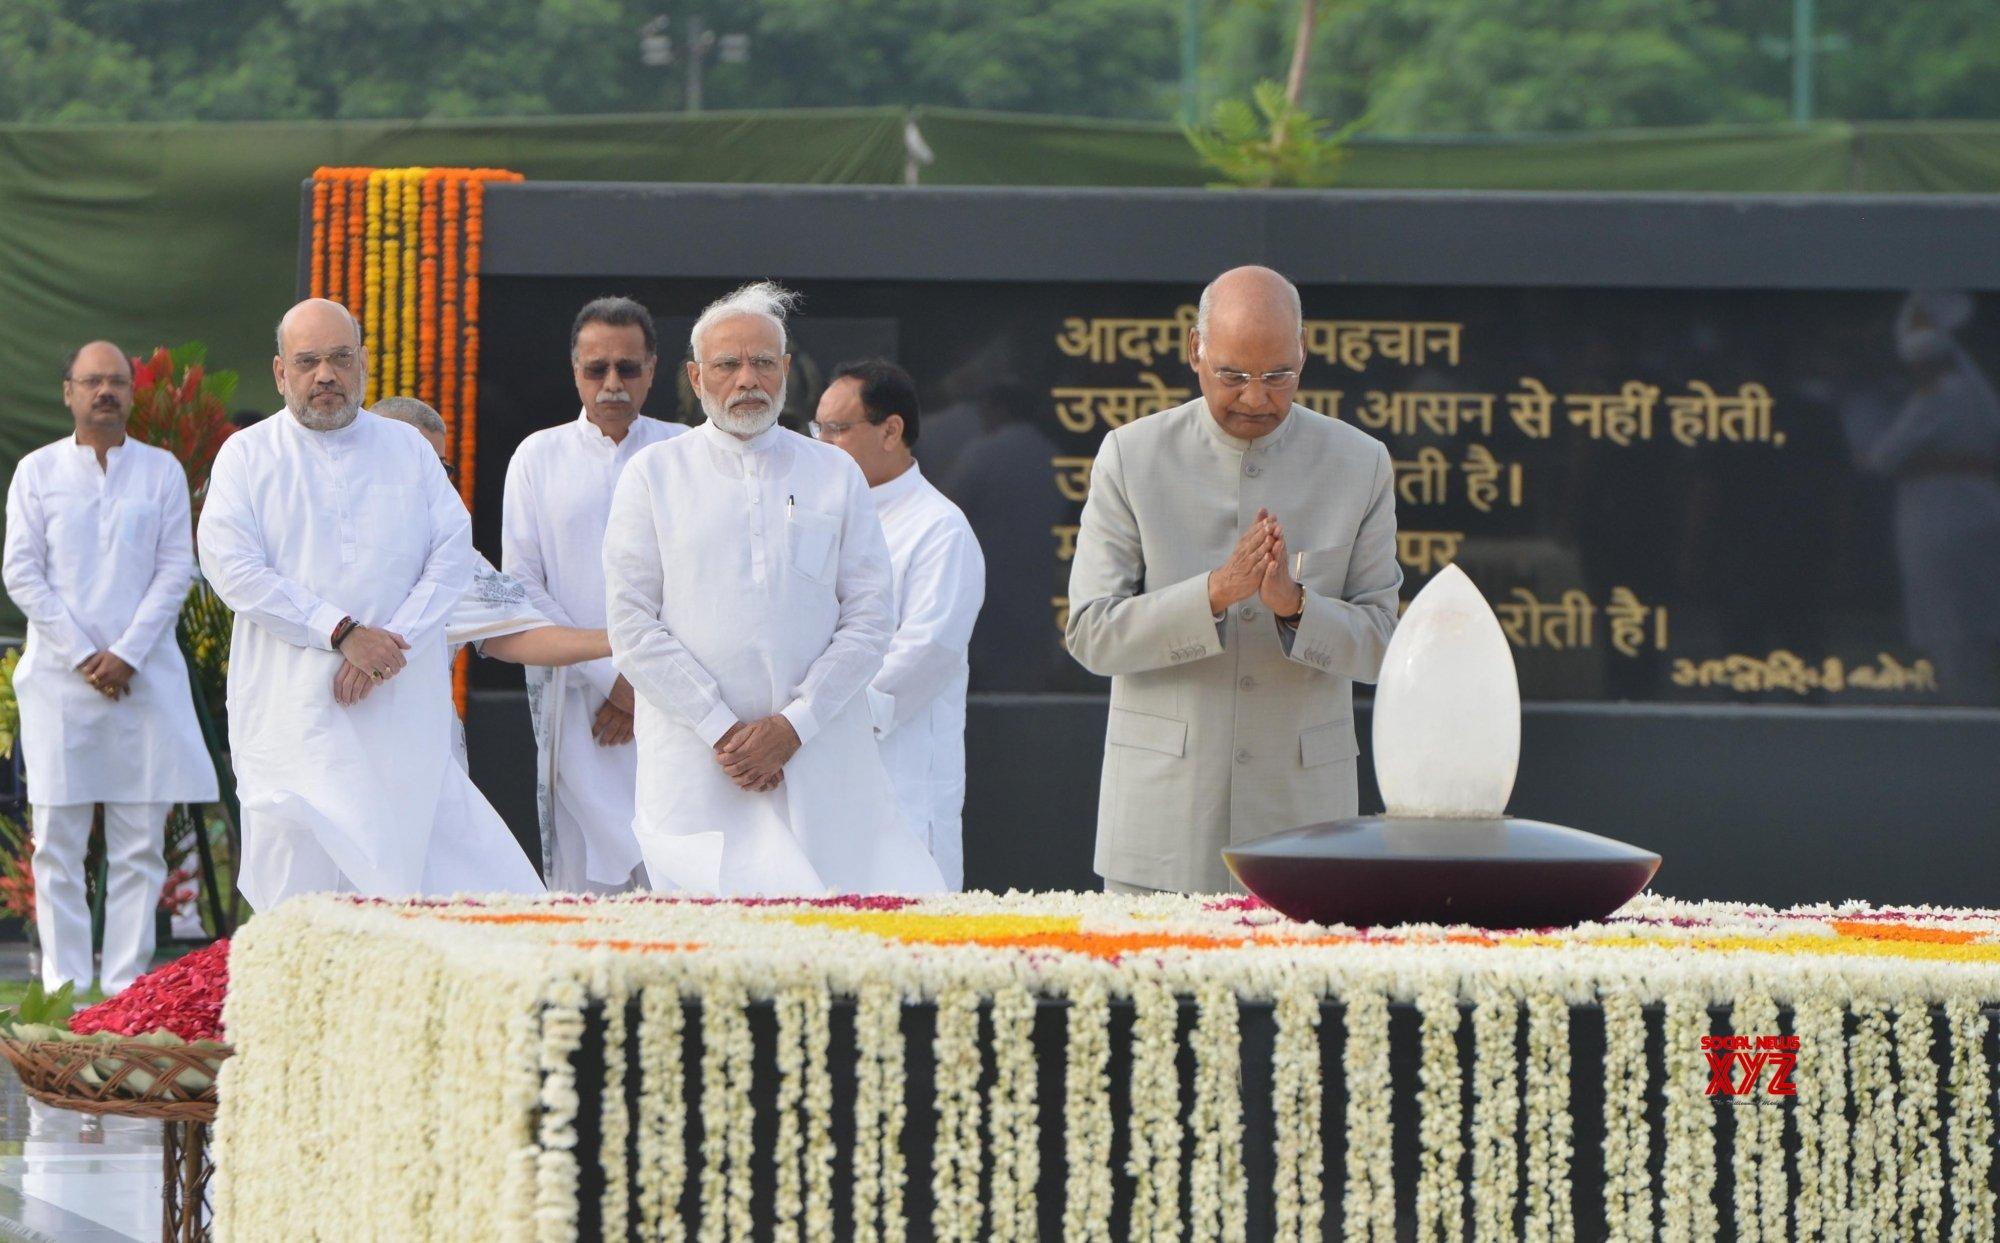 New Delhi: Atal Bihari Vajpayee's first death anniversary #Gallery